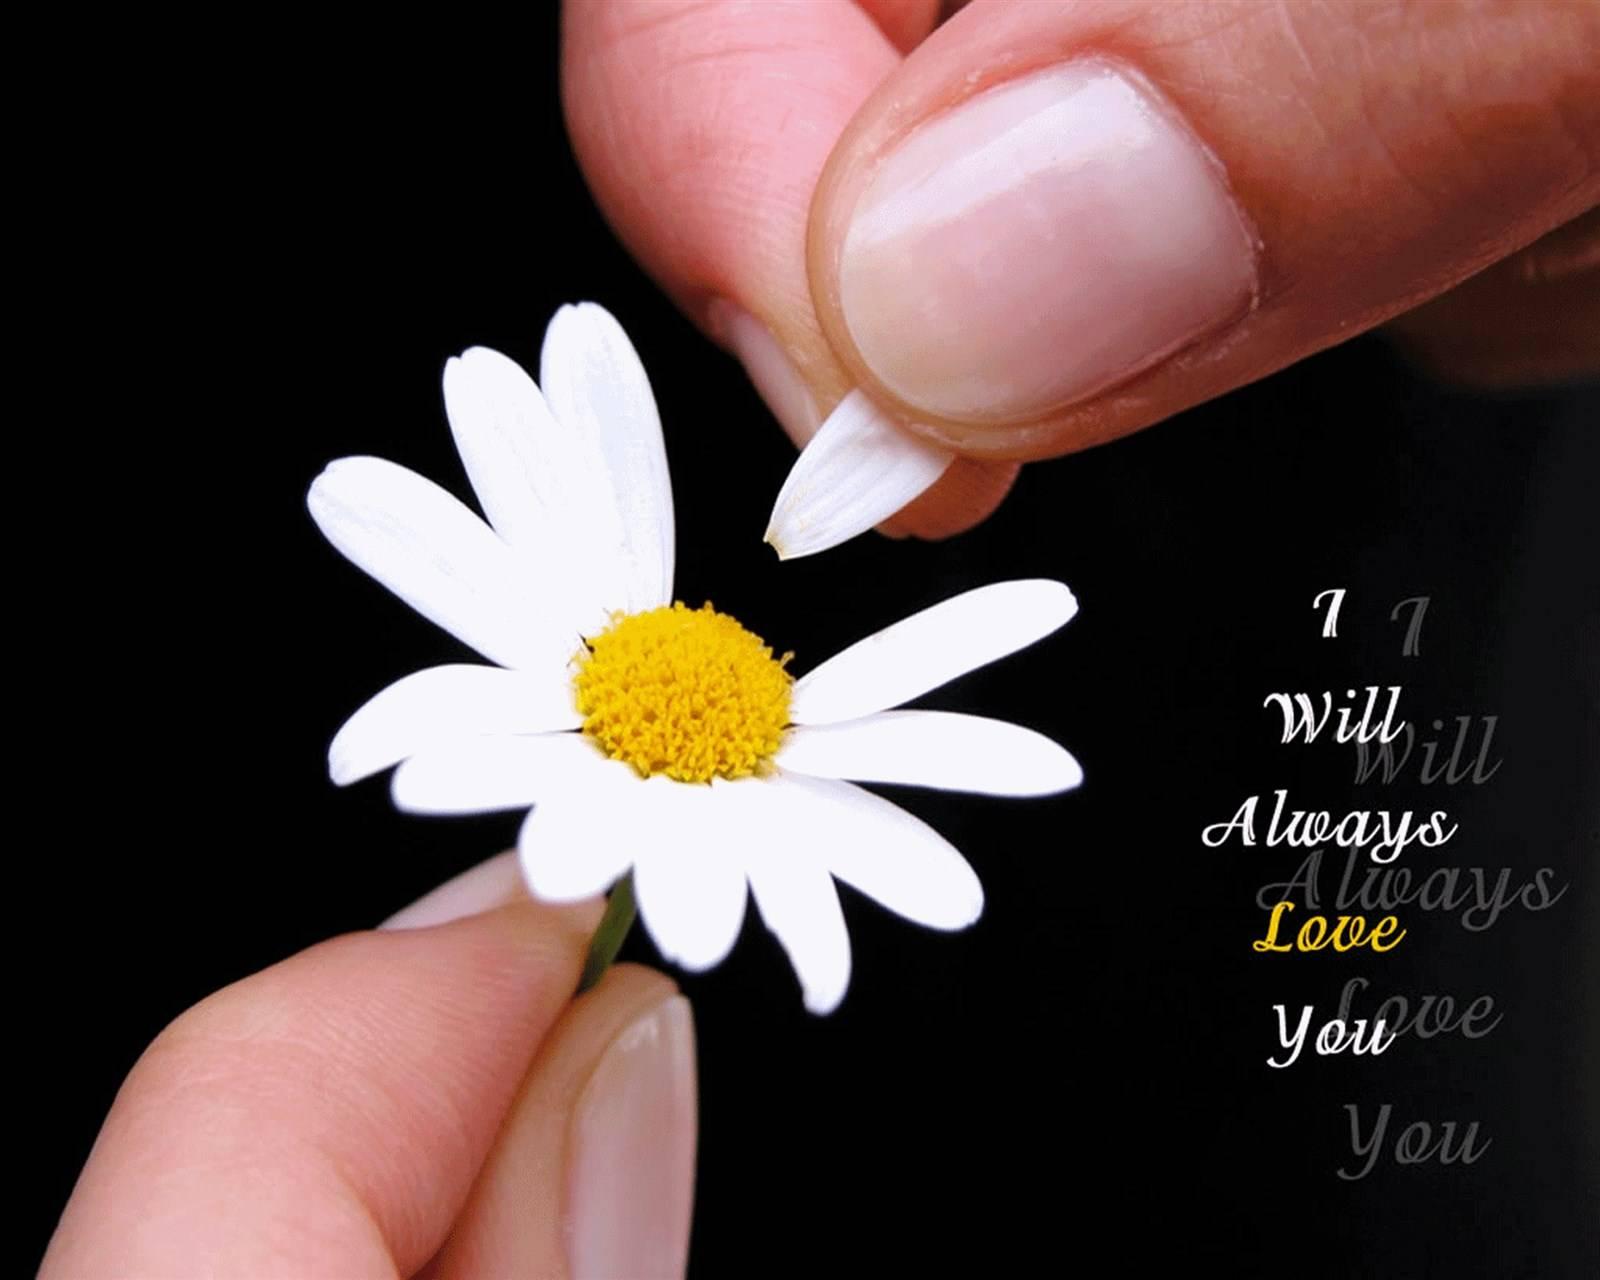 I will Always